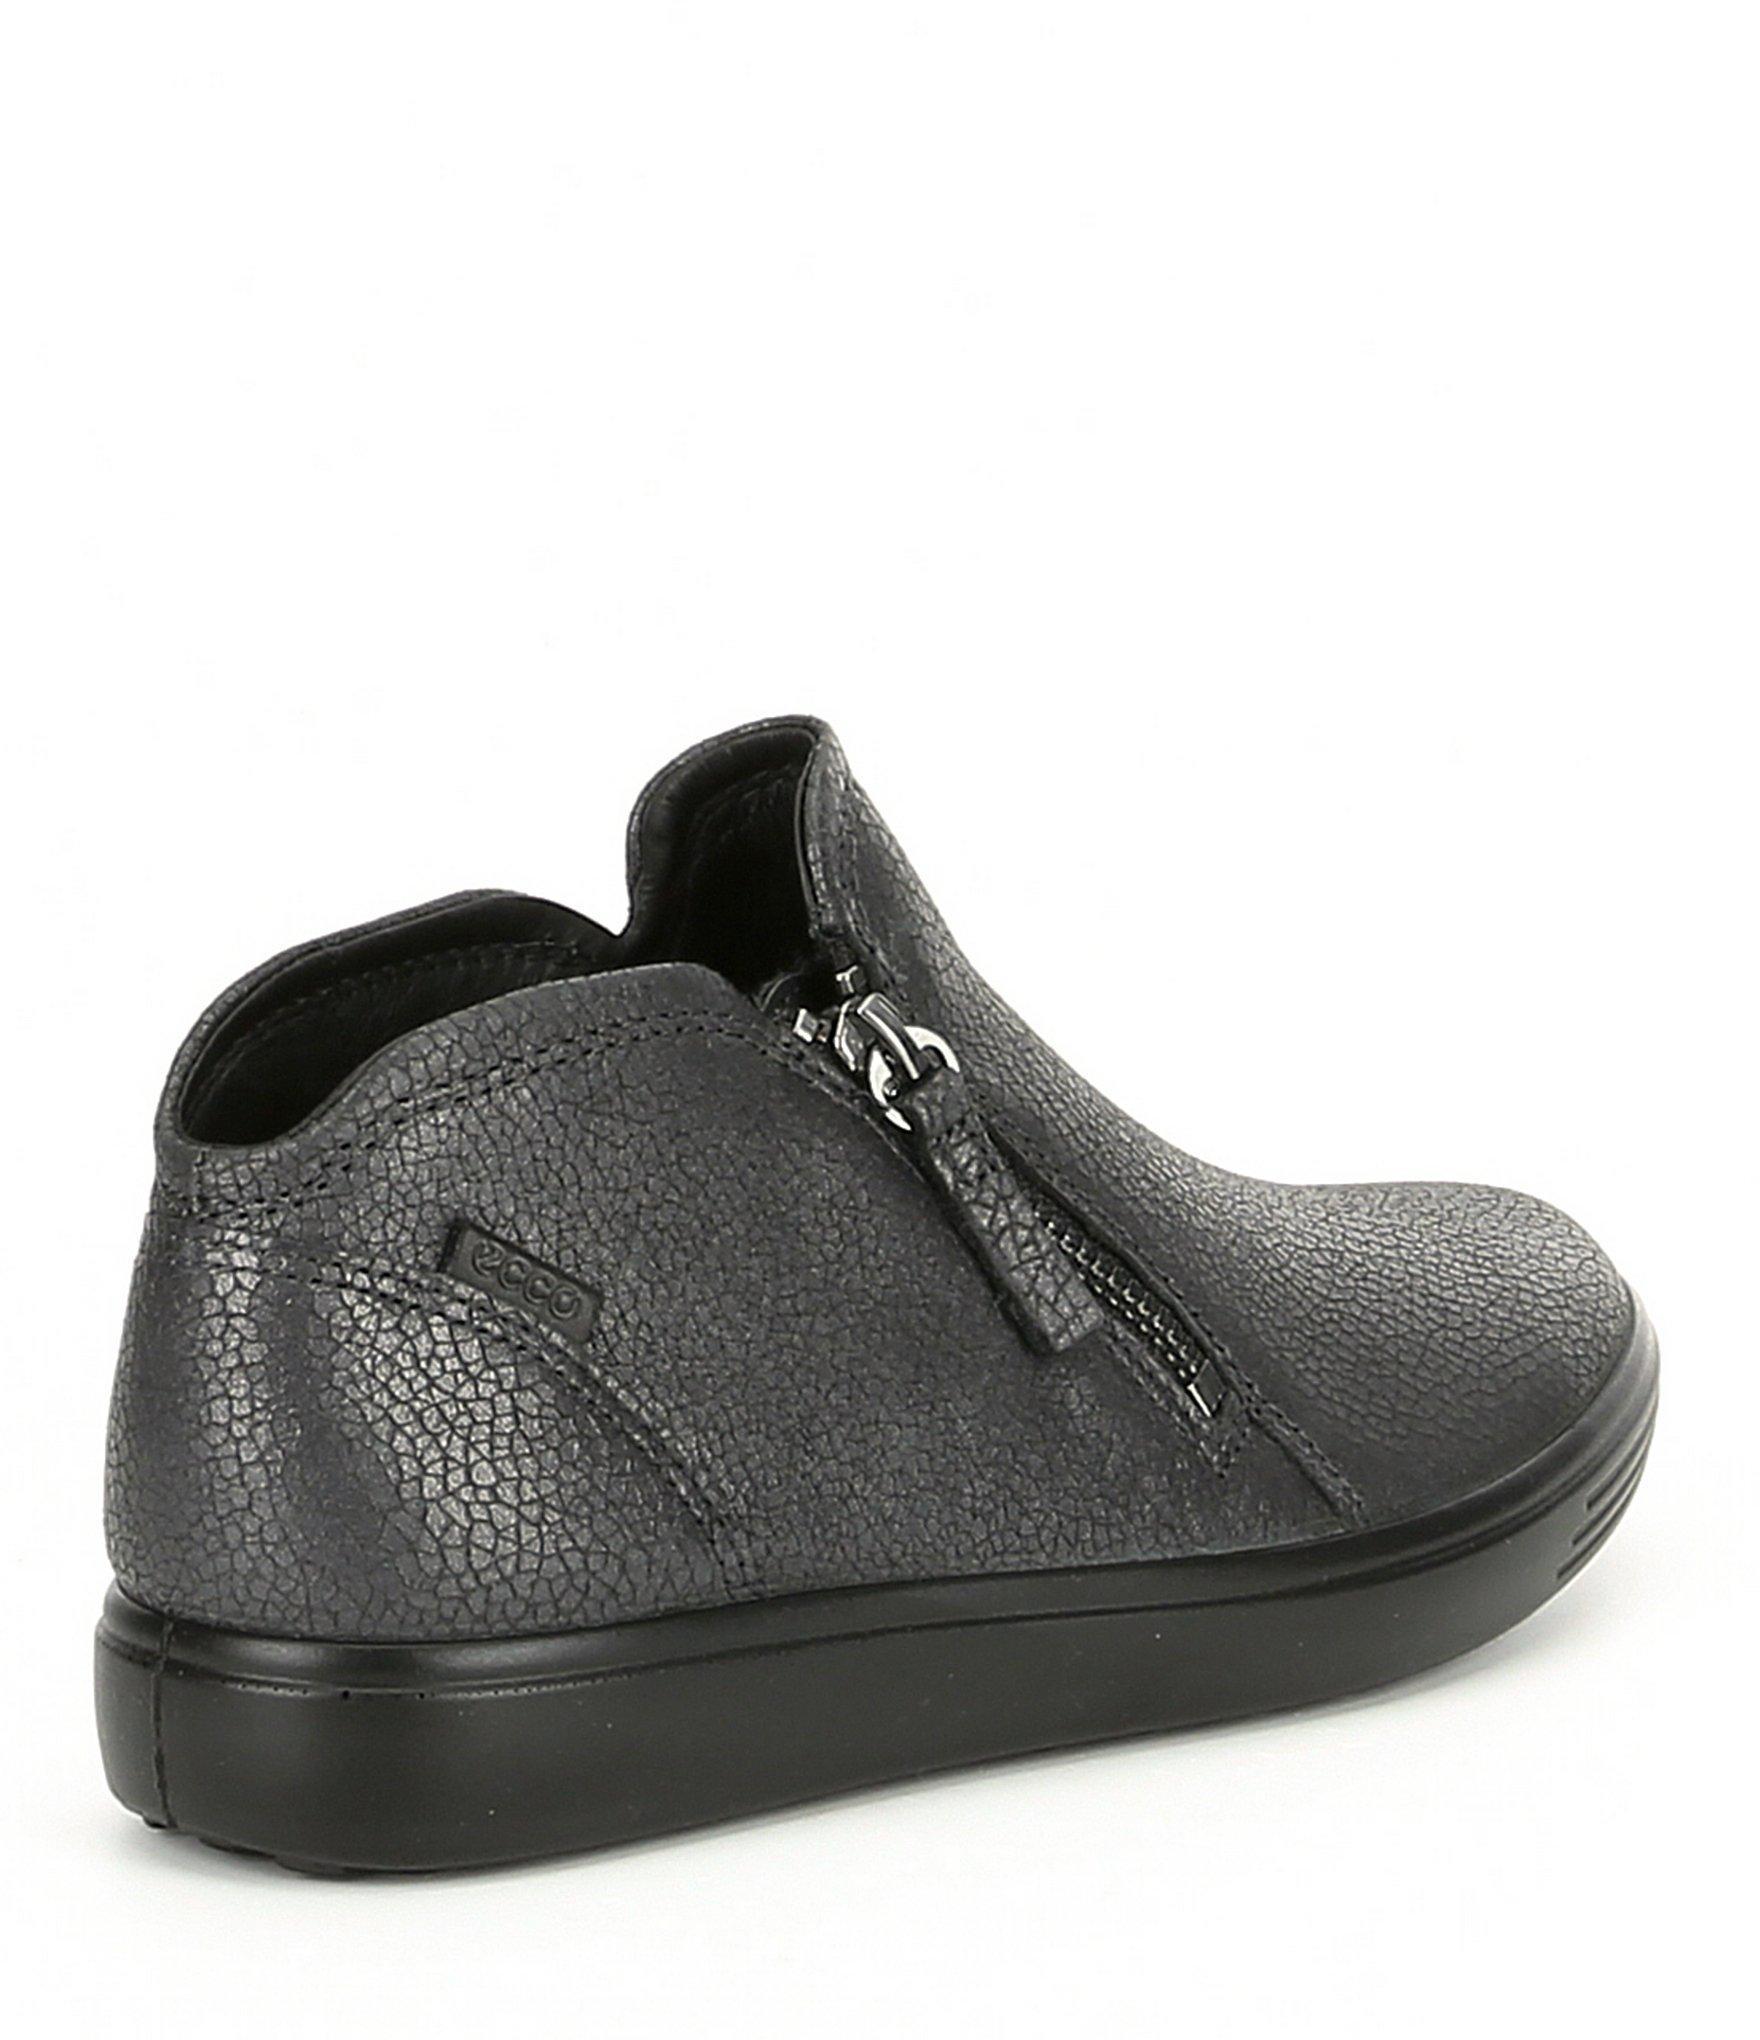 3d7cb1db23 Lyst - Ecco Women's Soft Low Cut Zip Bootie Sneakers in Gray